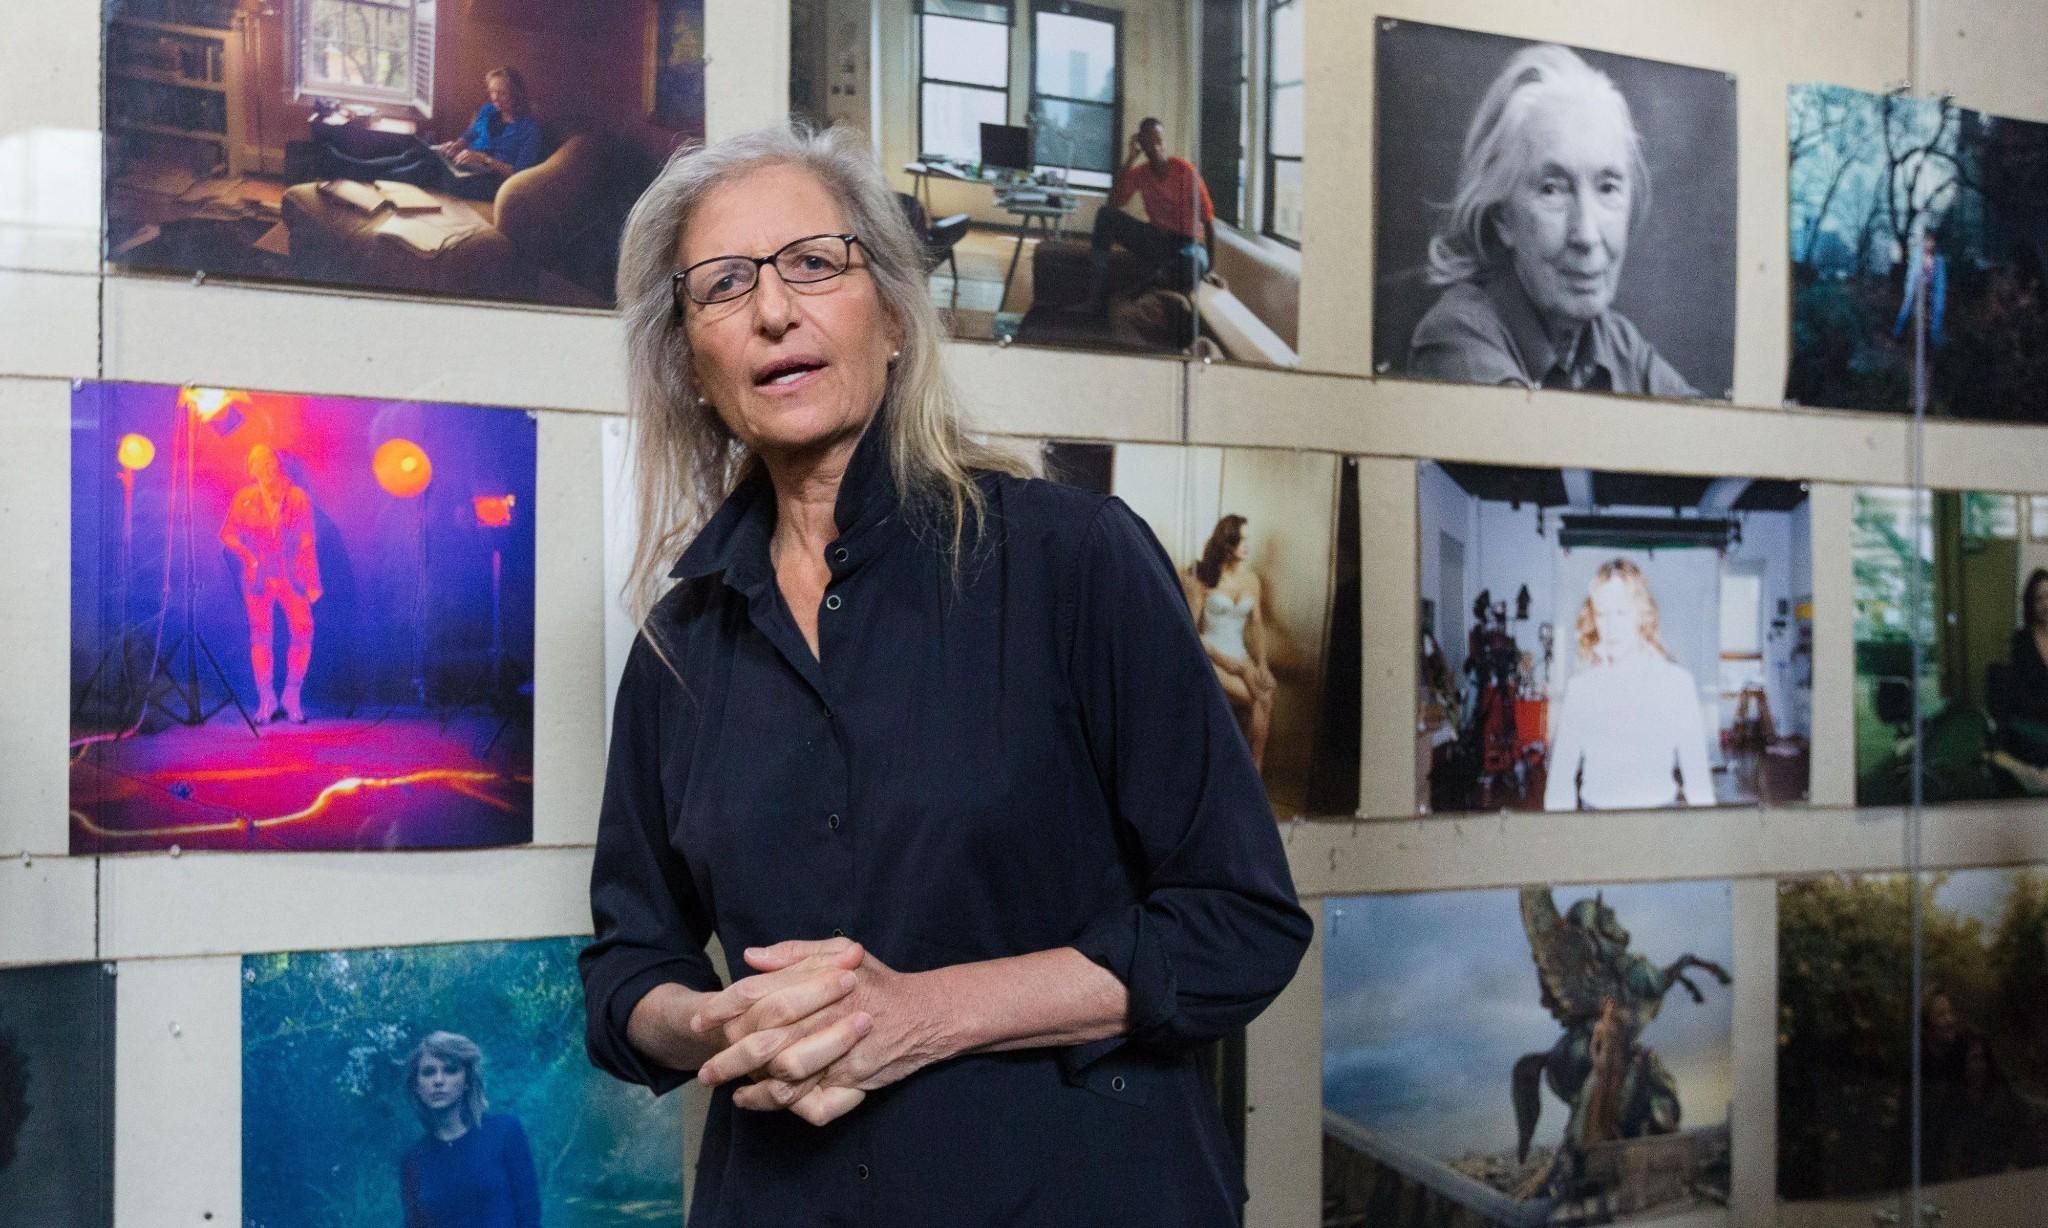 Annie Leibovitz: latest show explores women as 'whole human beings'